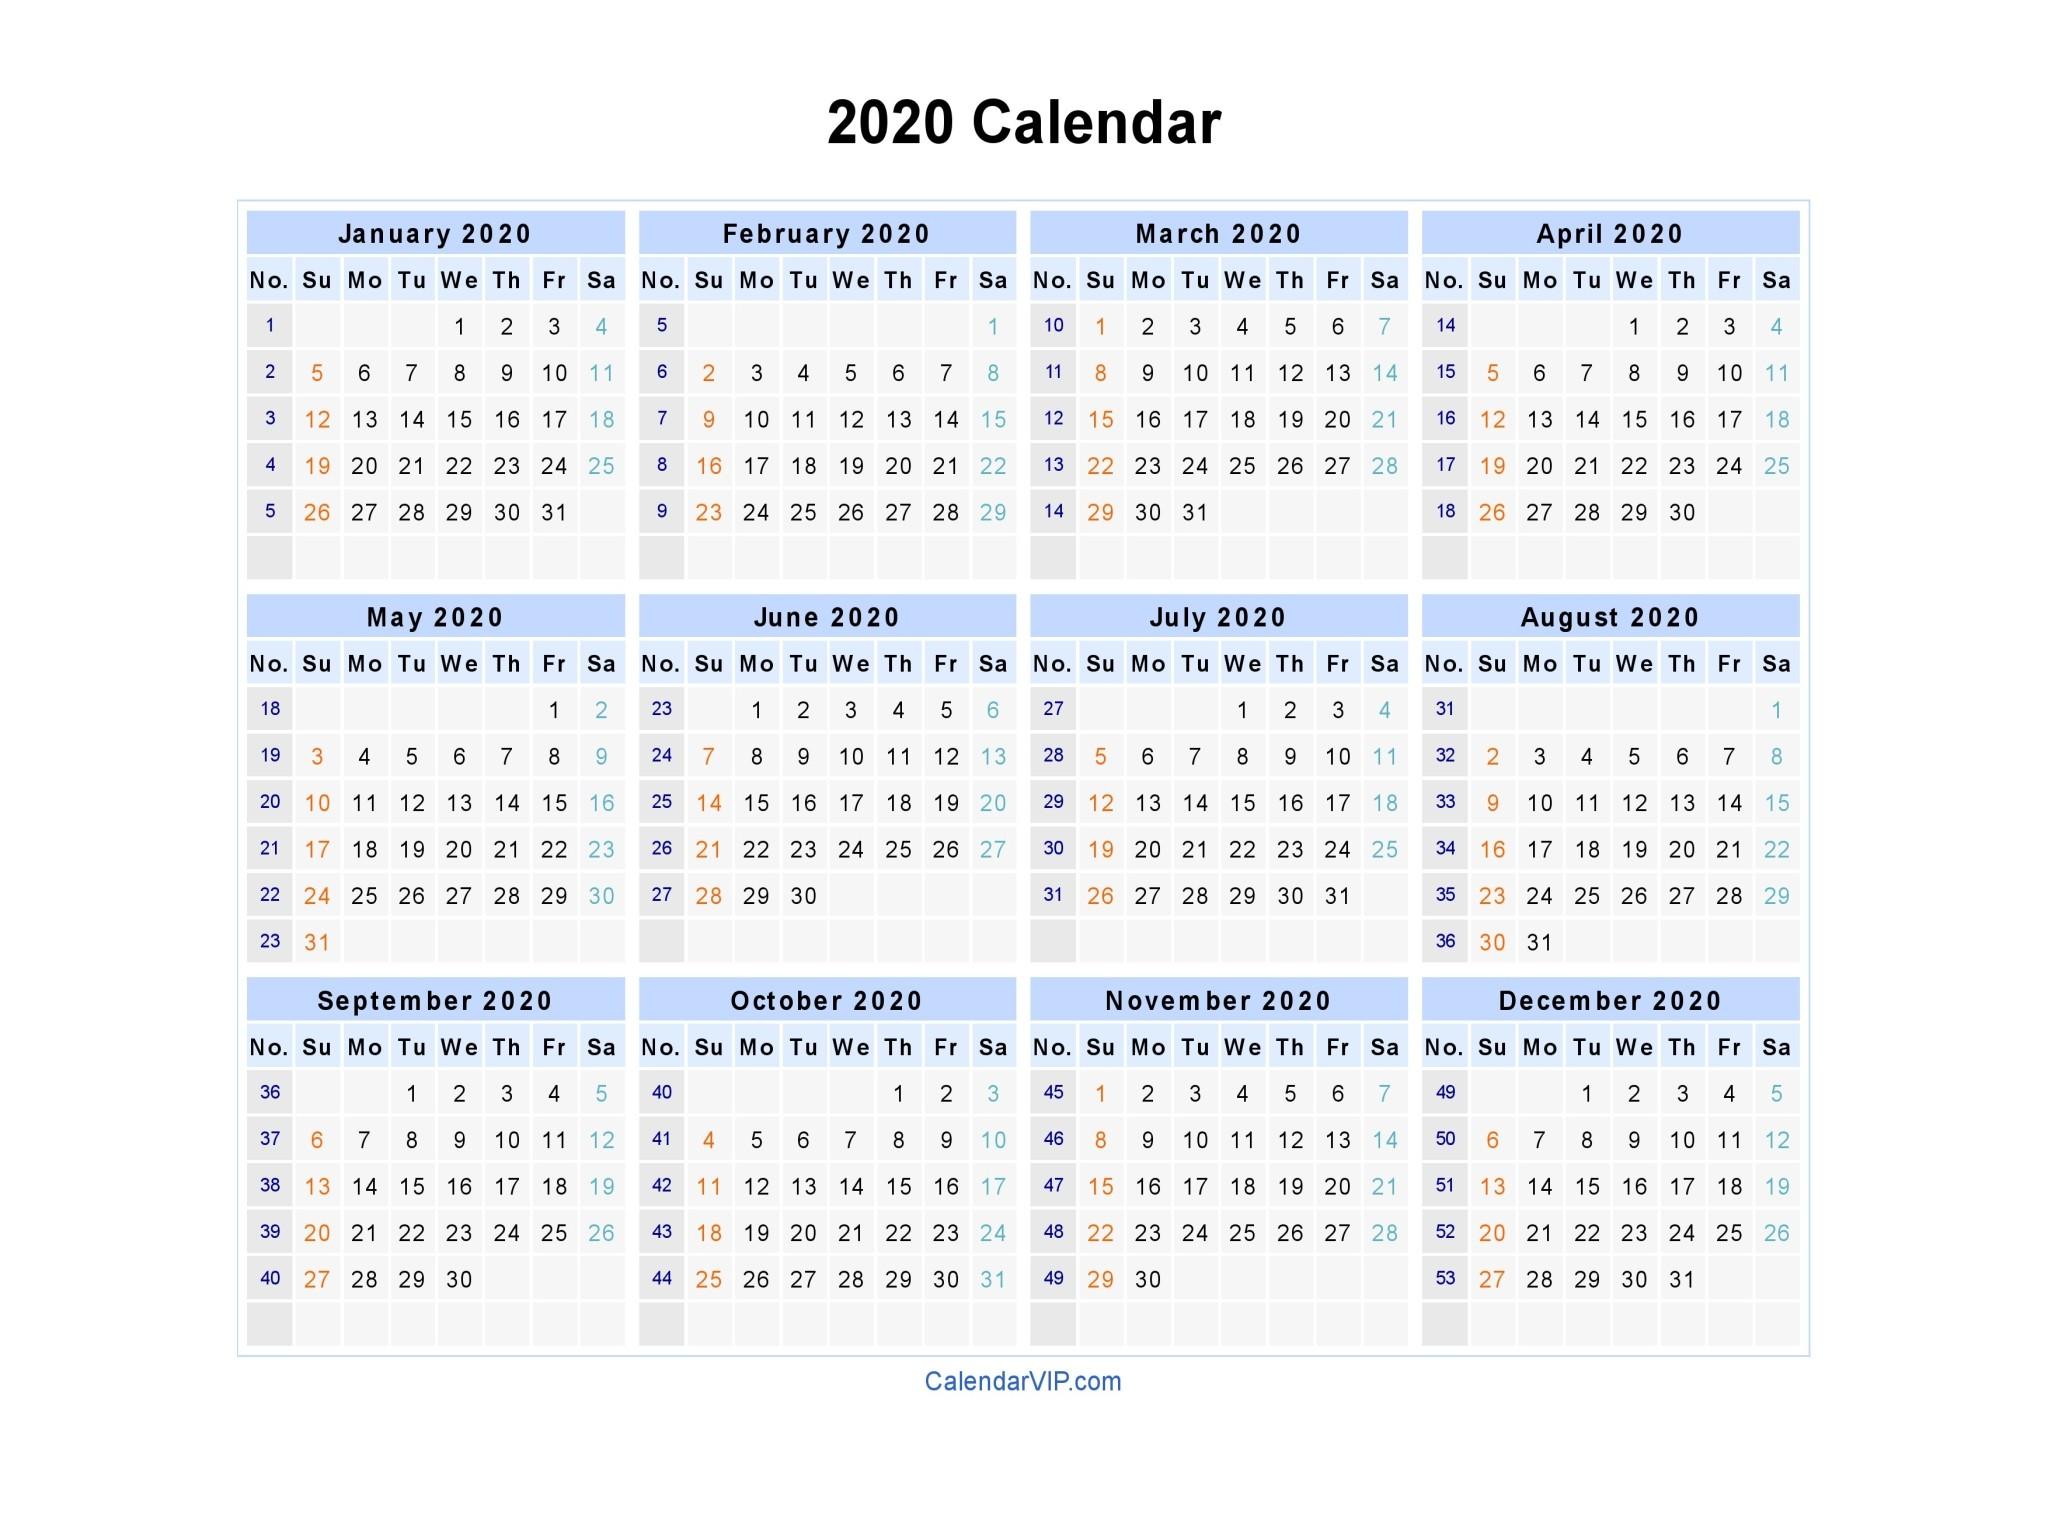 Calendar 2020 Printable Pdf 2020 Calendar Blank Printable Calendar Template In Pdf